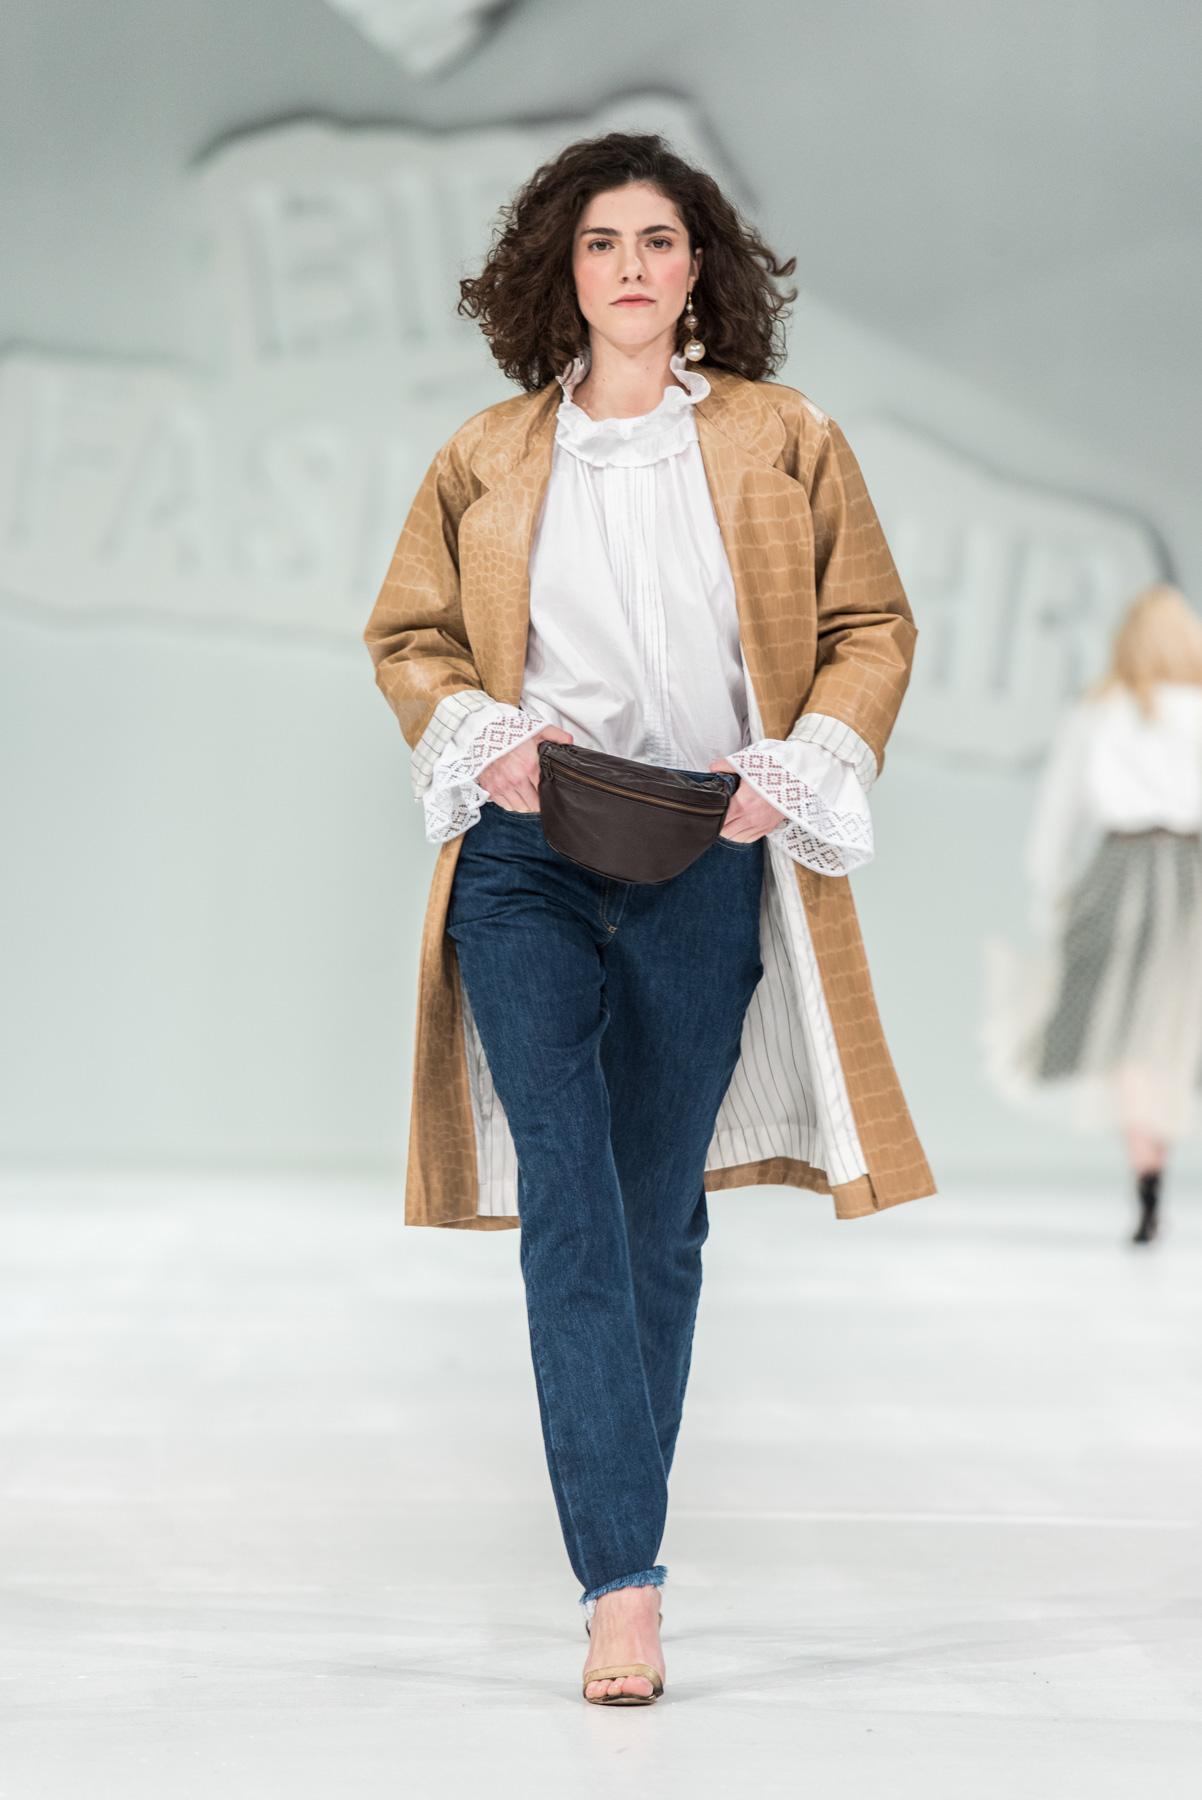 robert-sever-hrvatski-dizajner-iva-proljetna-kolekcija-2018 (31).jpg